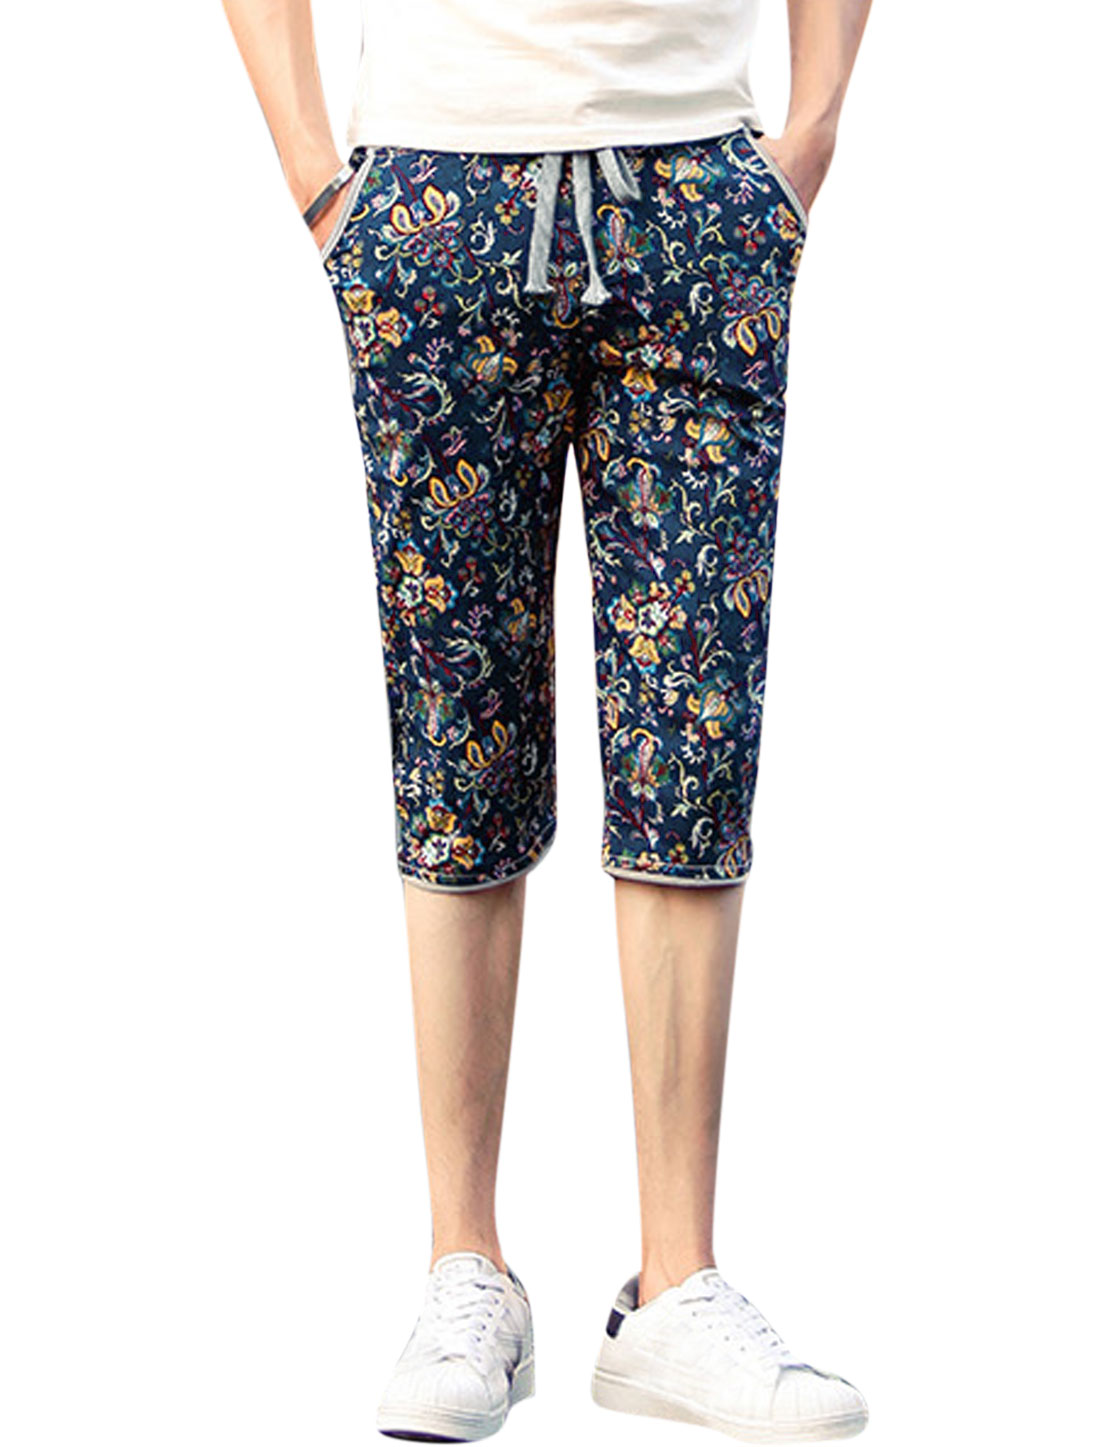 Men Elastic Waist Floral Prints Casual Capri Pants Navy Blue S